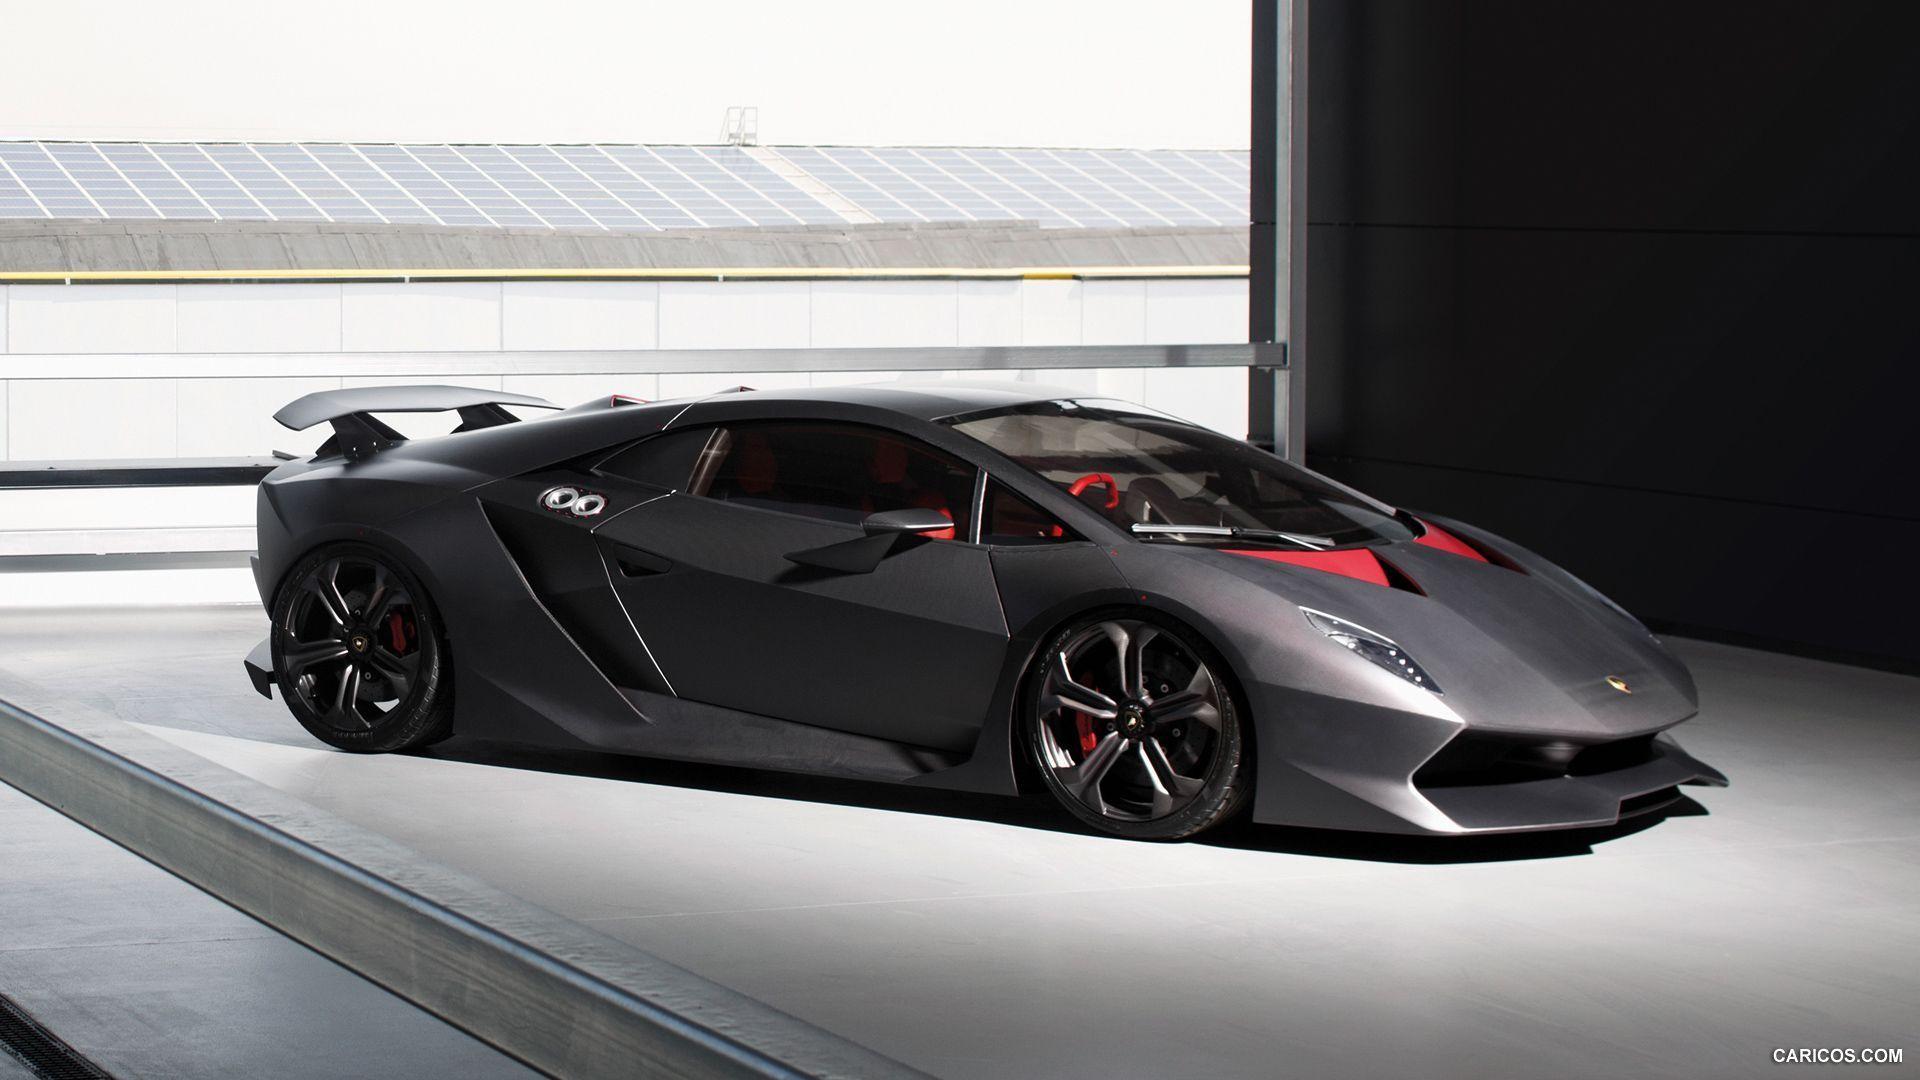 3840x2160 Wallpaper Lamborghini, Sesto Elemento, Black, Front View 3840x2160